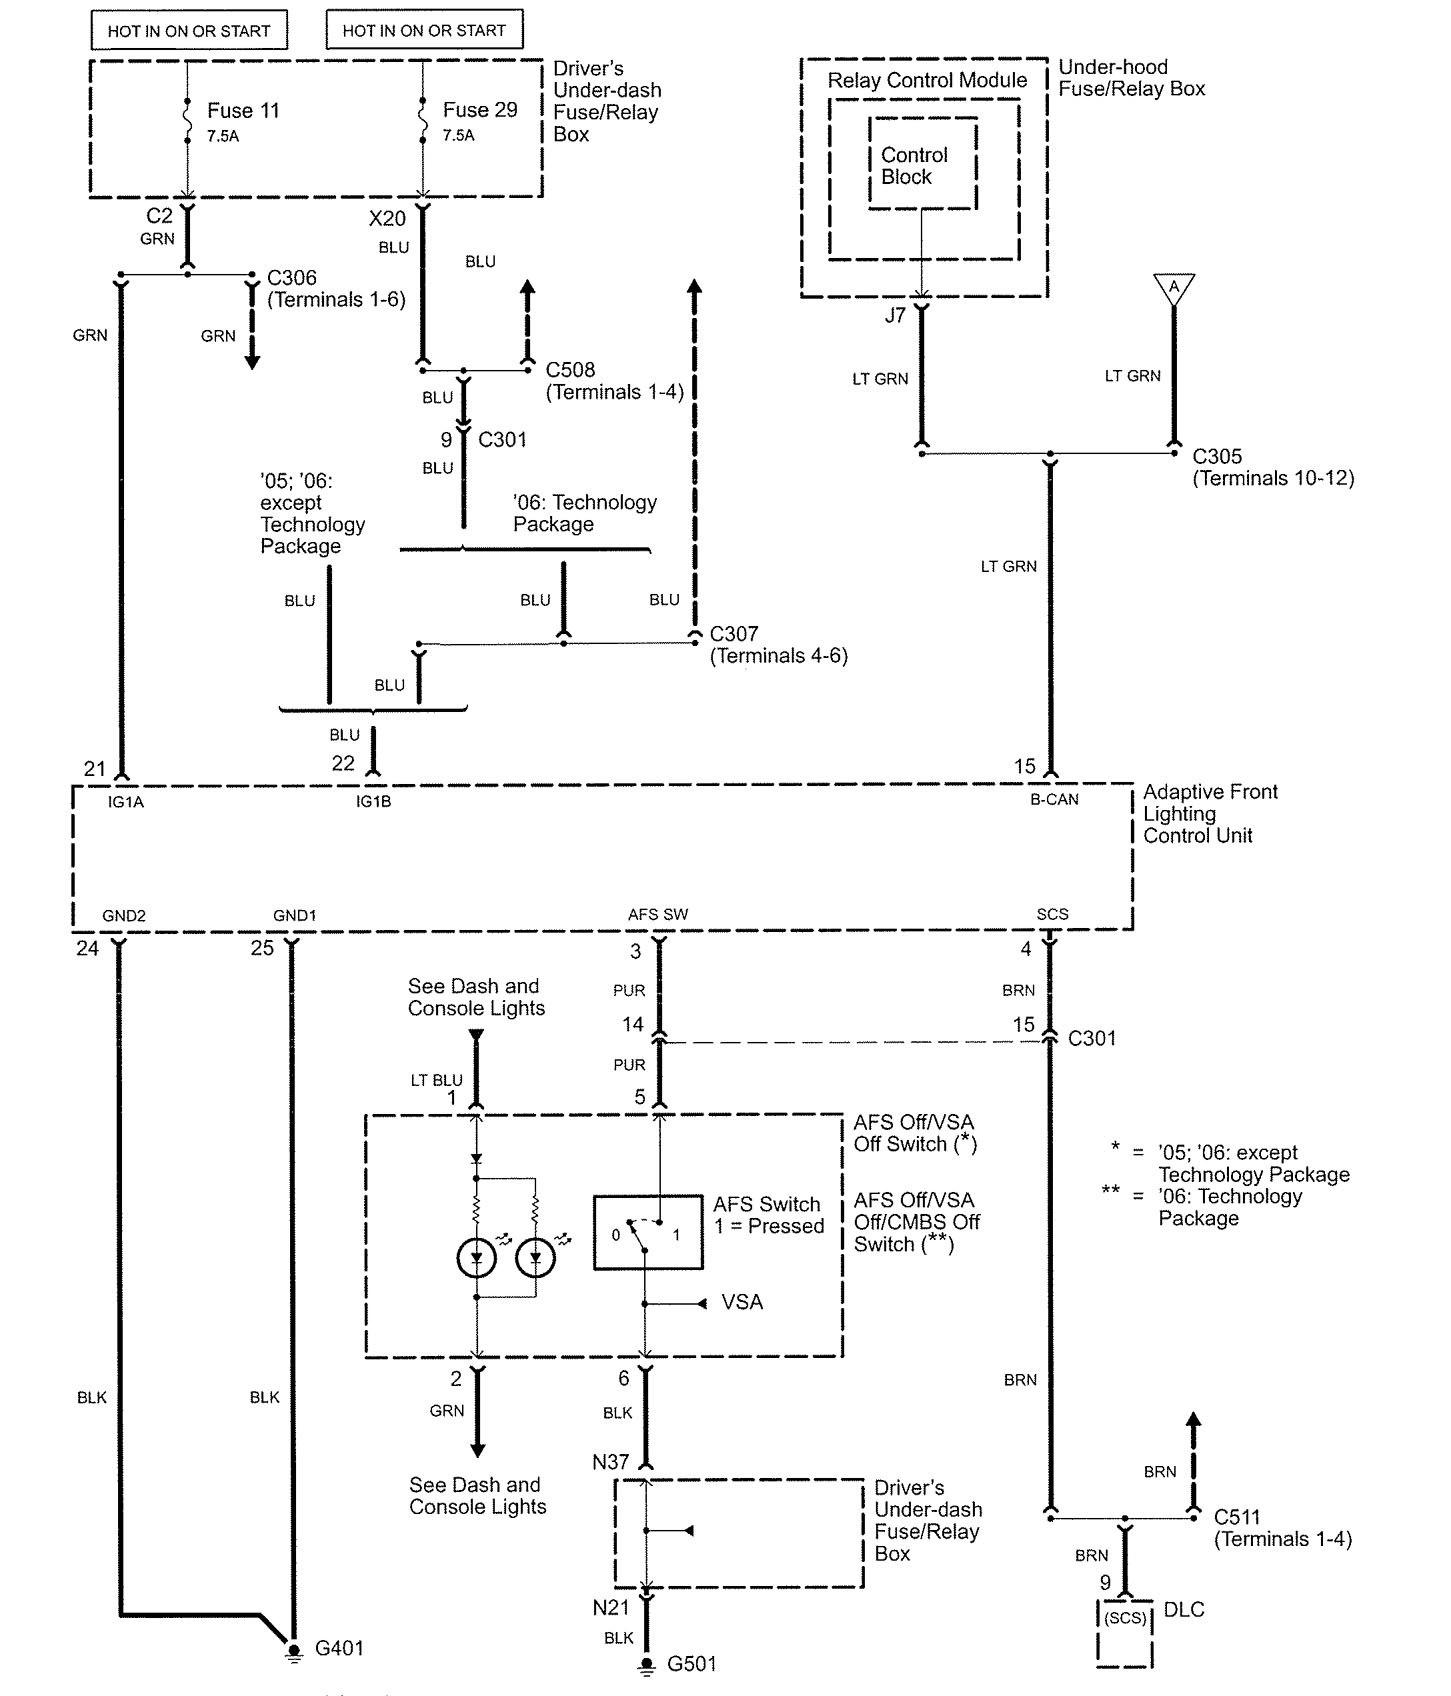 car lighting system wiring diagram big tex trailer 7 pin acura rl 2005 diagrams adaptive front